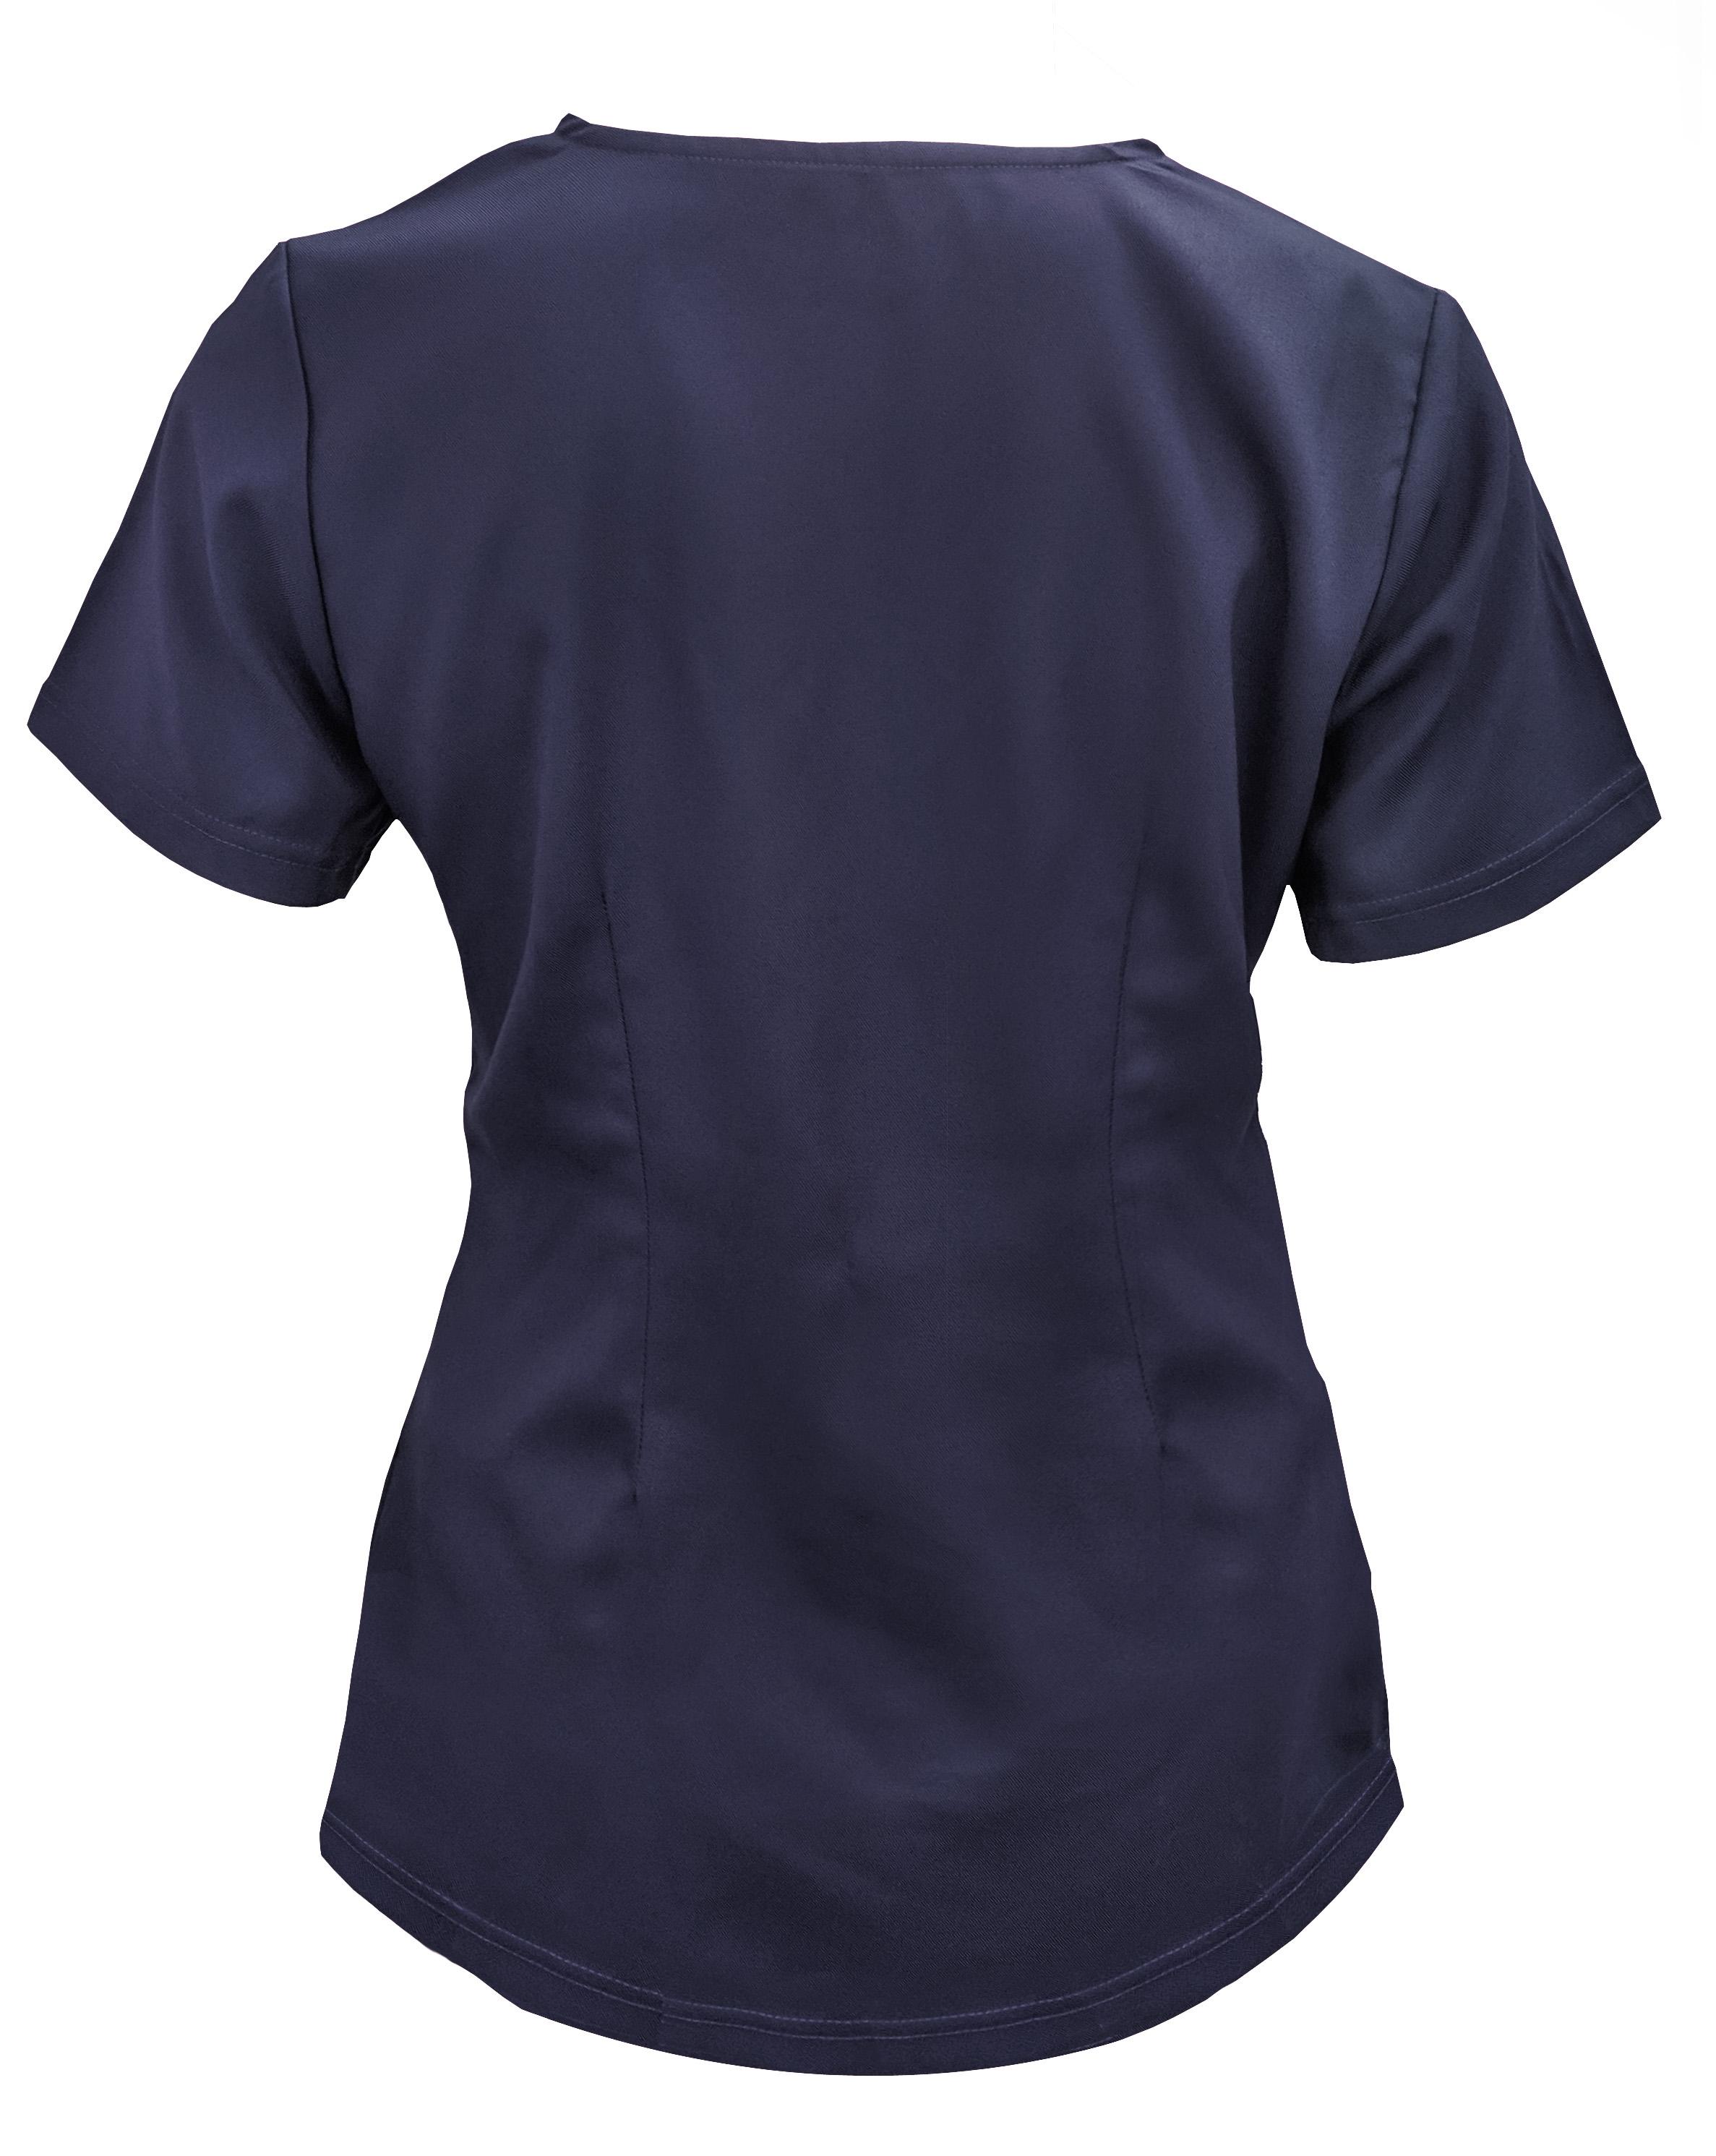 Soulful-Scrubs-Women-039-s-2336-2-Pocket-V-Neck-Scrub-Top miniature 12